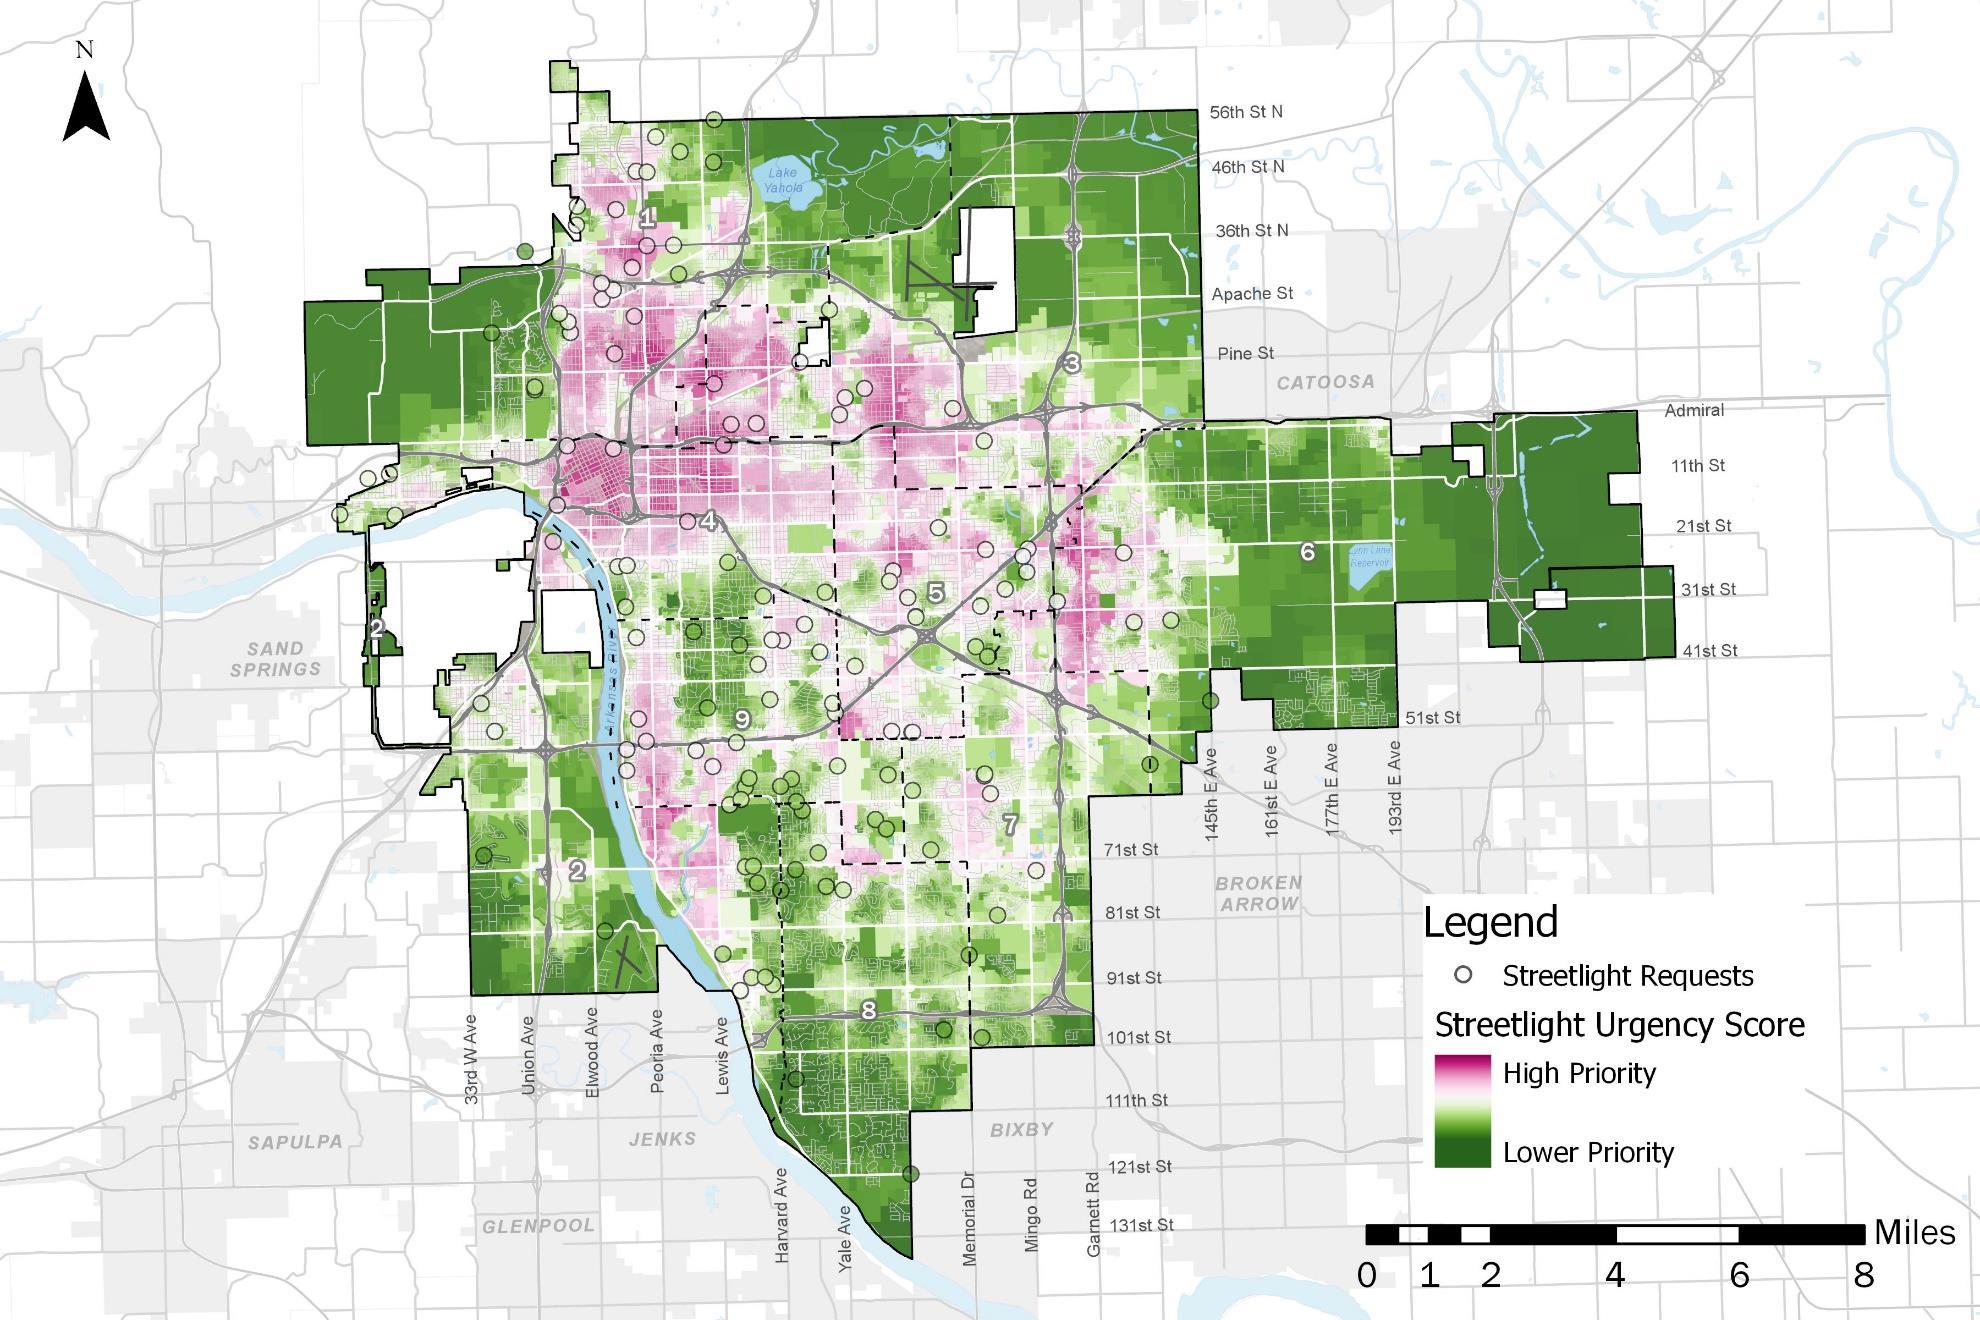 Map of Streetlight Requests